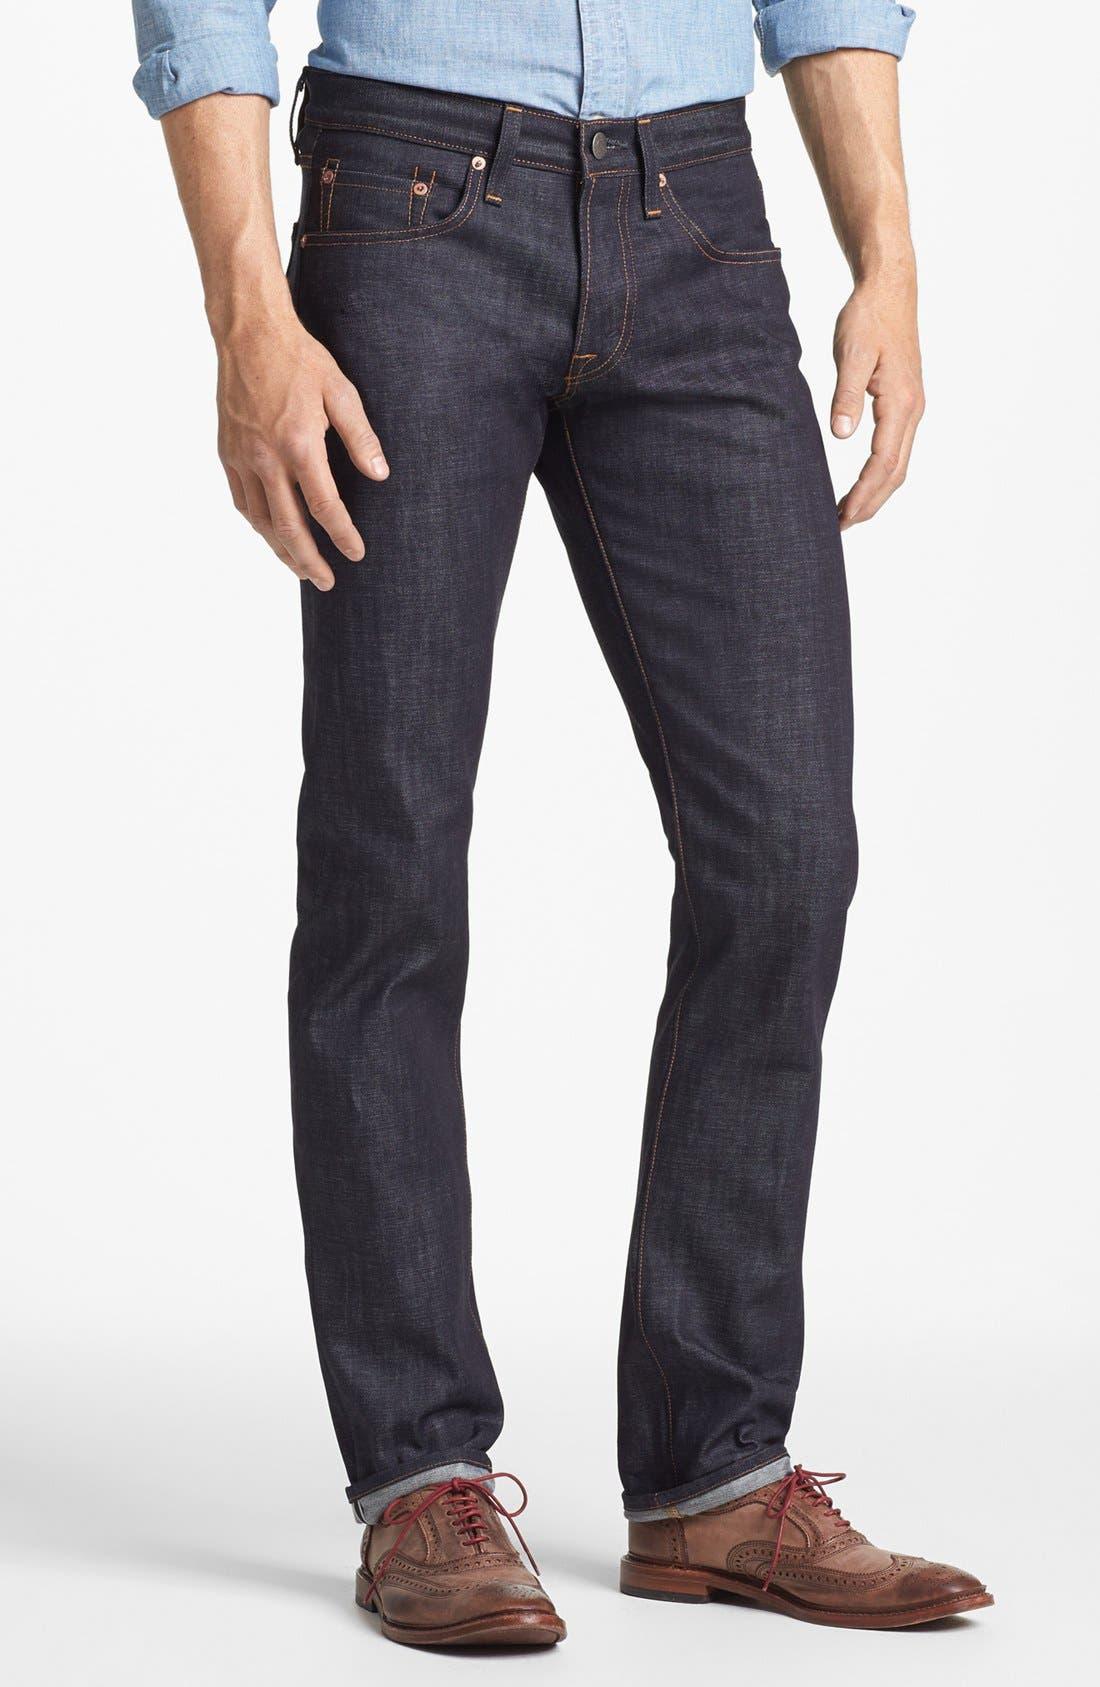 Alternate Image 1 Selected - J Brand 'Tyler' Slim Fit Jeans (Raw Selvedge)